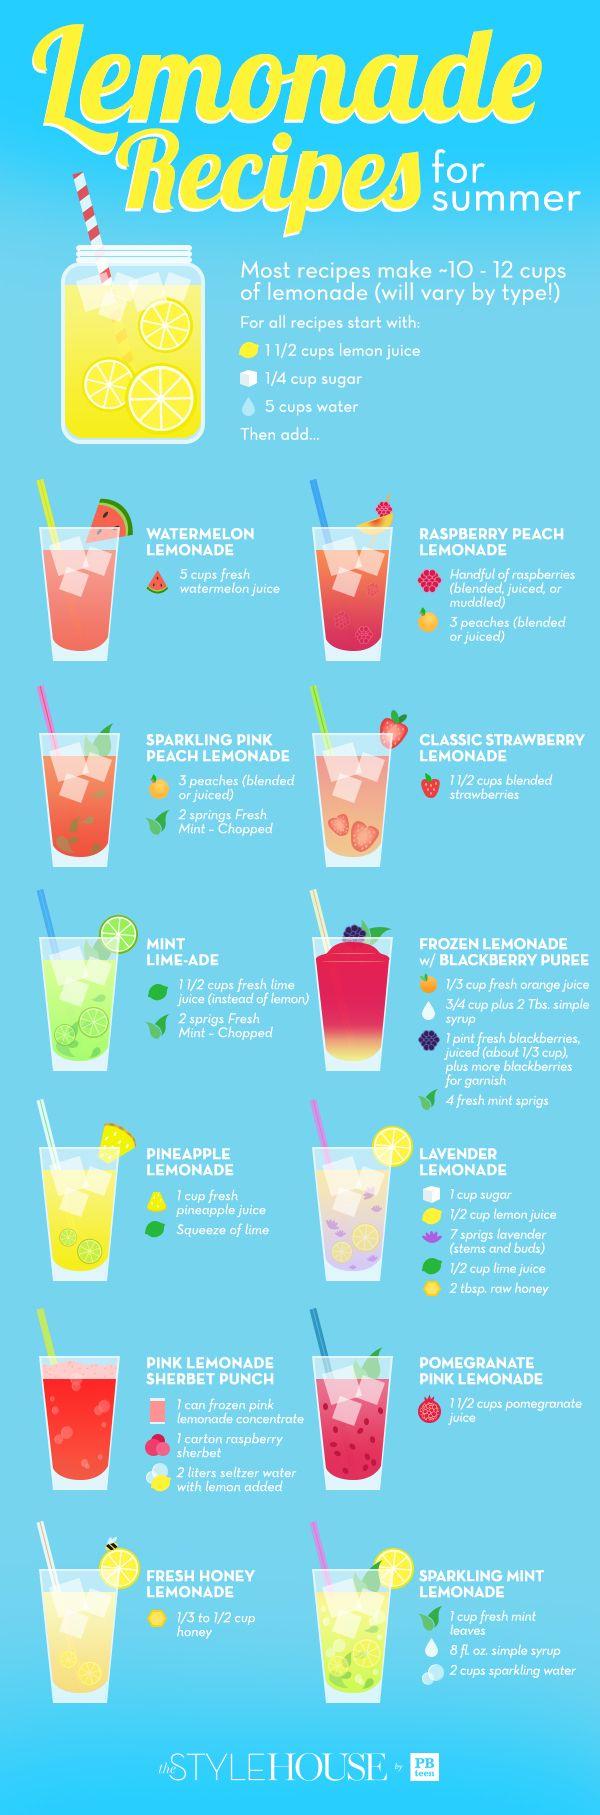 12 different lemonade recipes